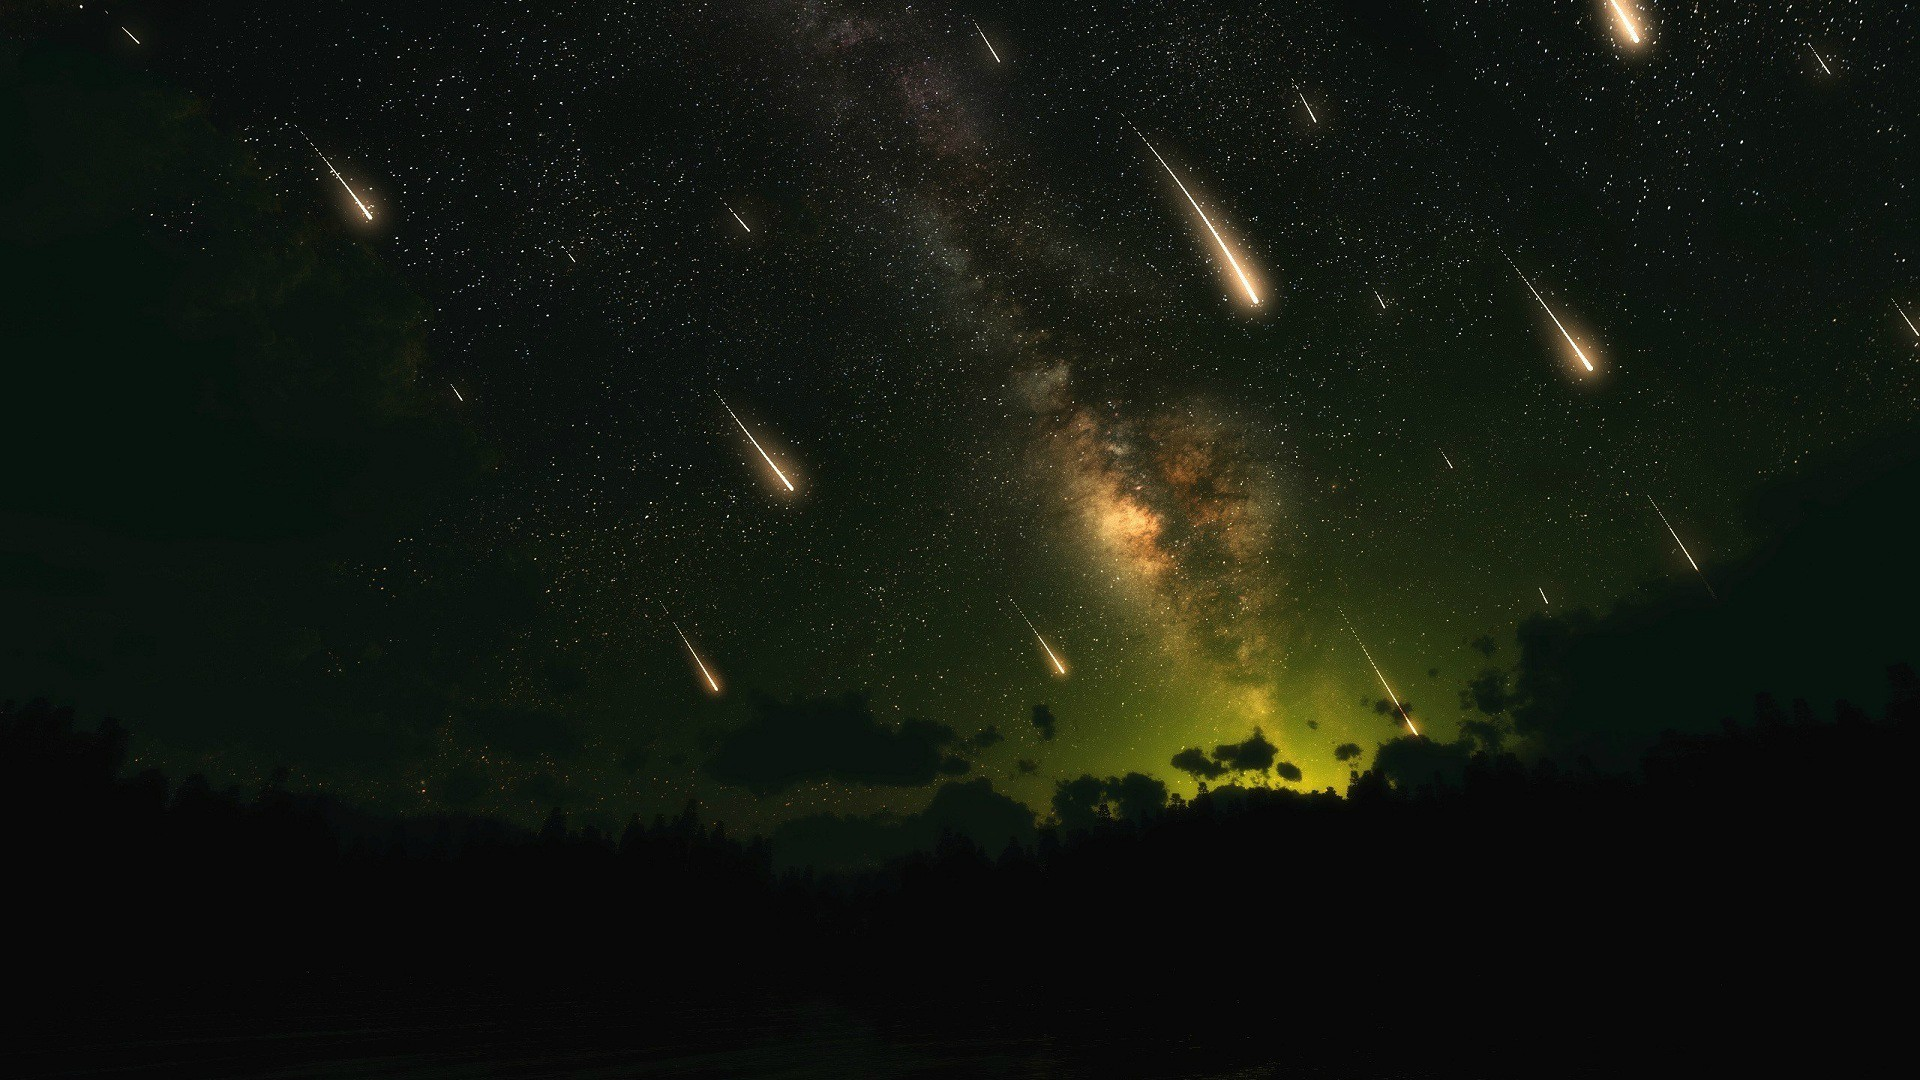 skyrim shooting stars